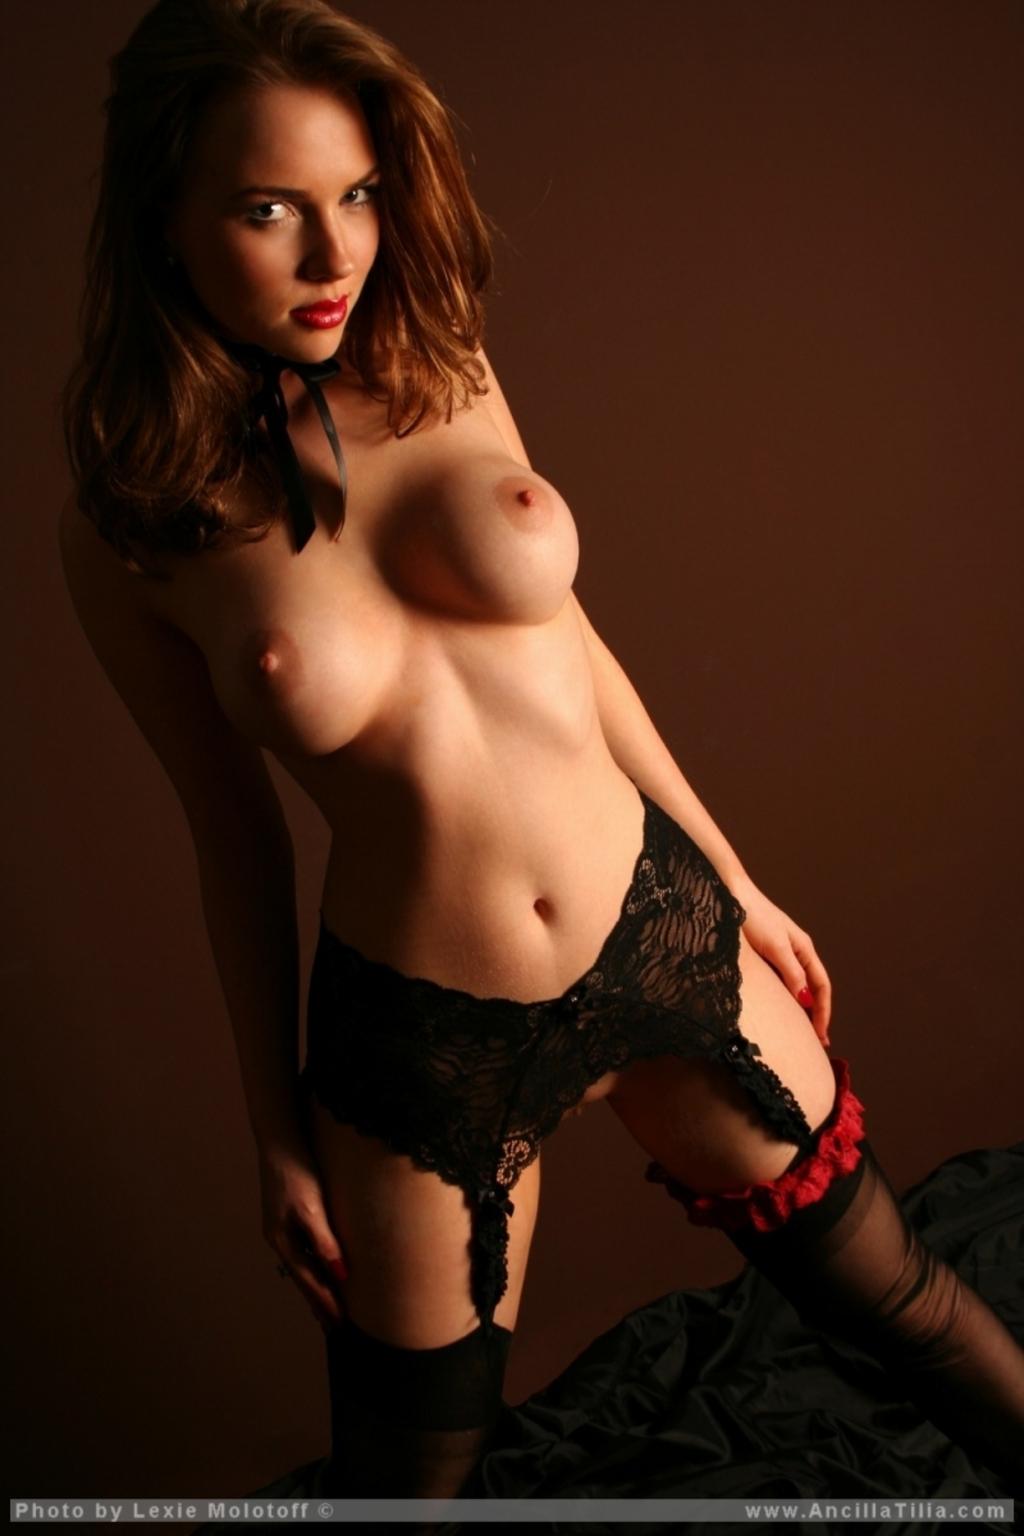 Jaclyn Swedberg Nude | Hot Girl HD Wallpaper